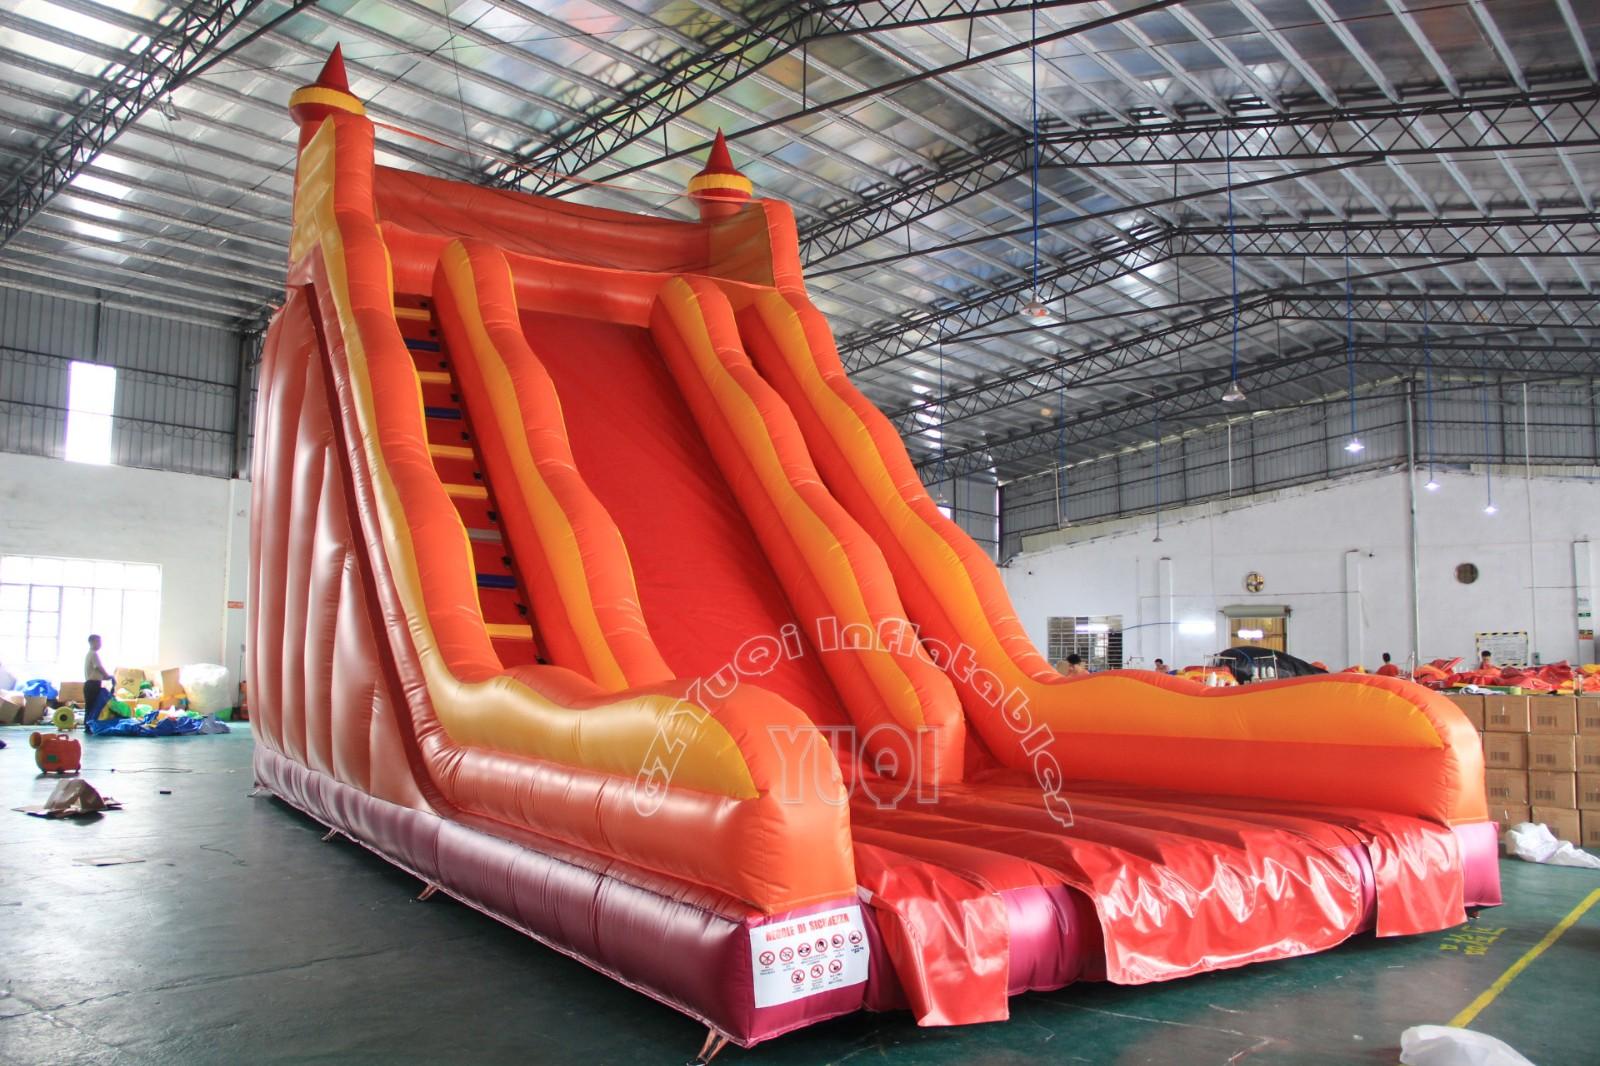 YUQI-Yq336 Giant Inflatable Slides ,big Adult Toys Inflatable Slip And Slide